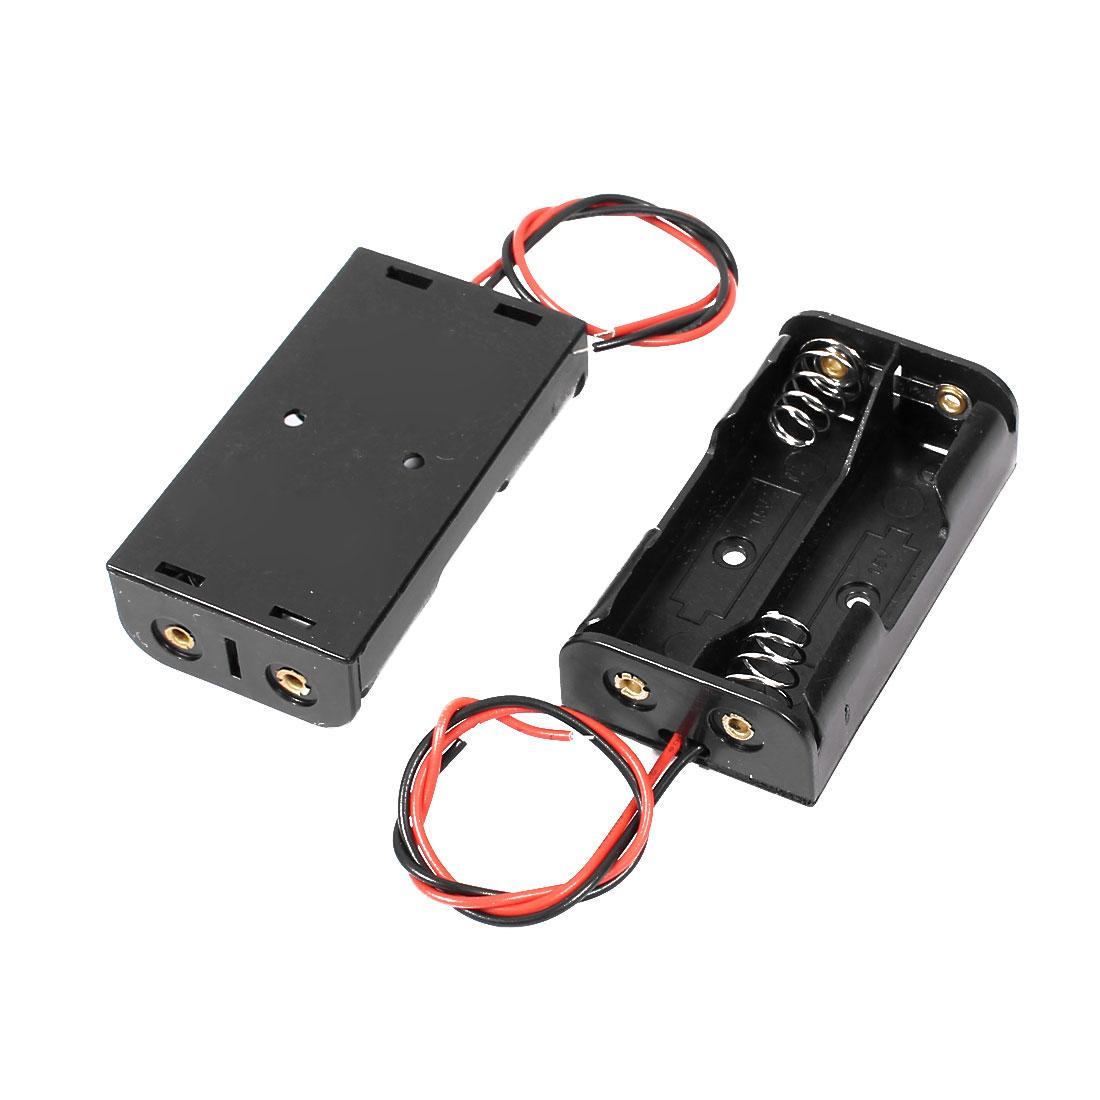 Plastic Shell Spring Clip Design 2-Wire 4 x 1.5V AA Battery Holder Case Box 2Pcs